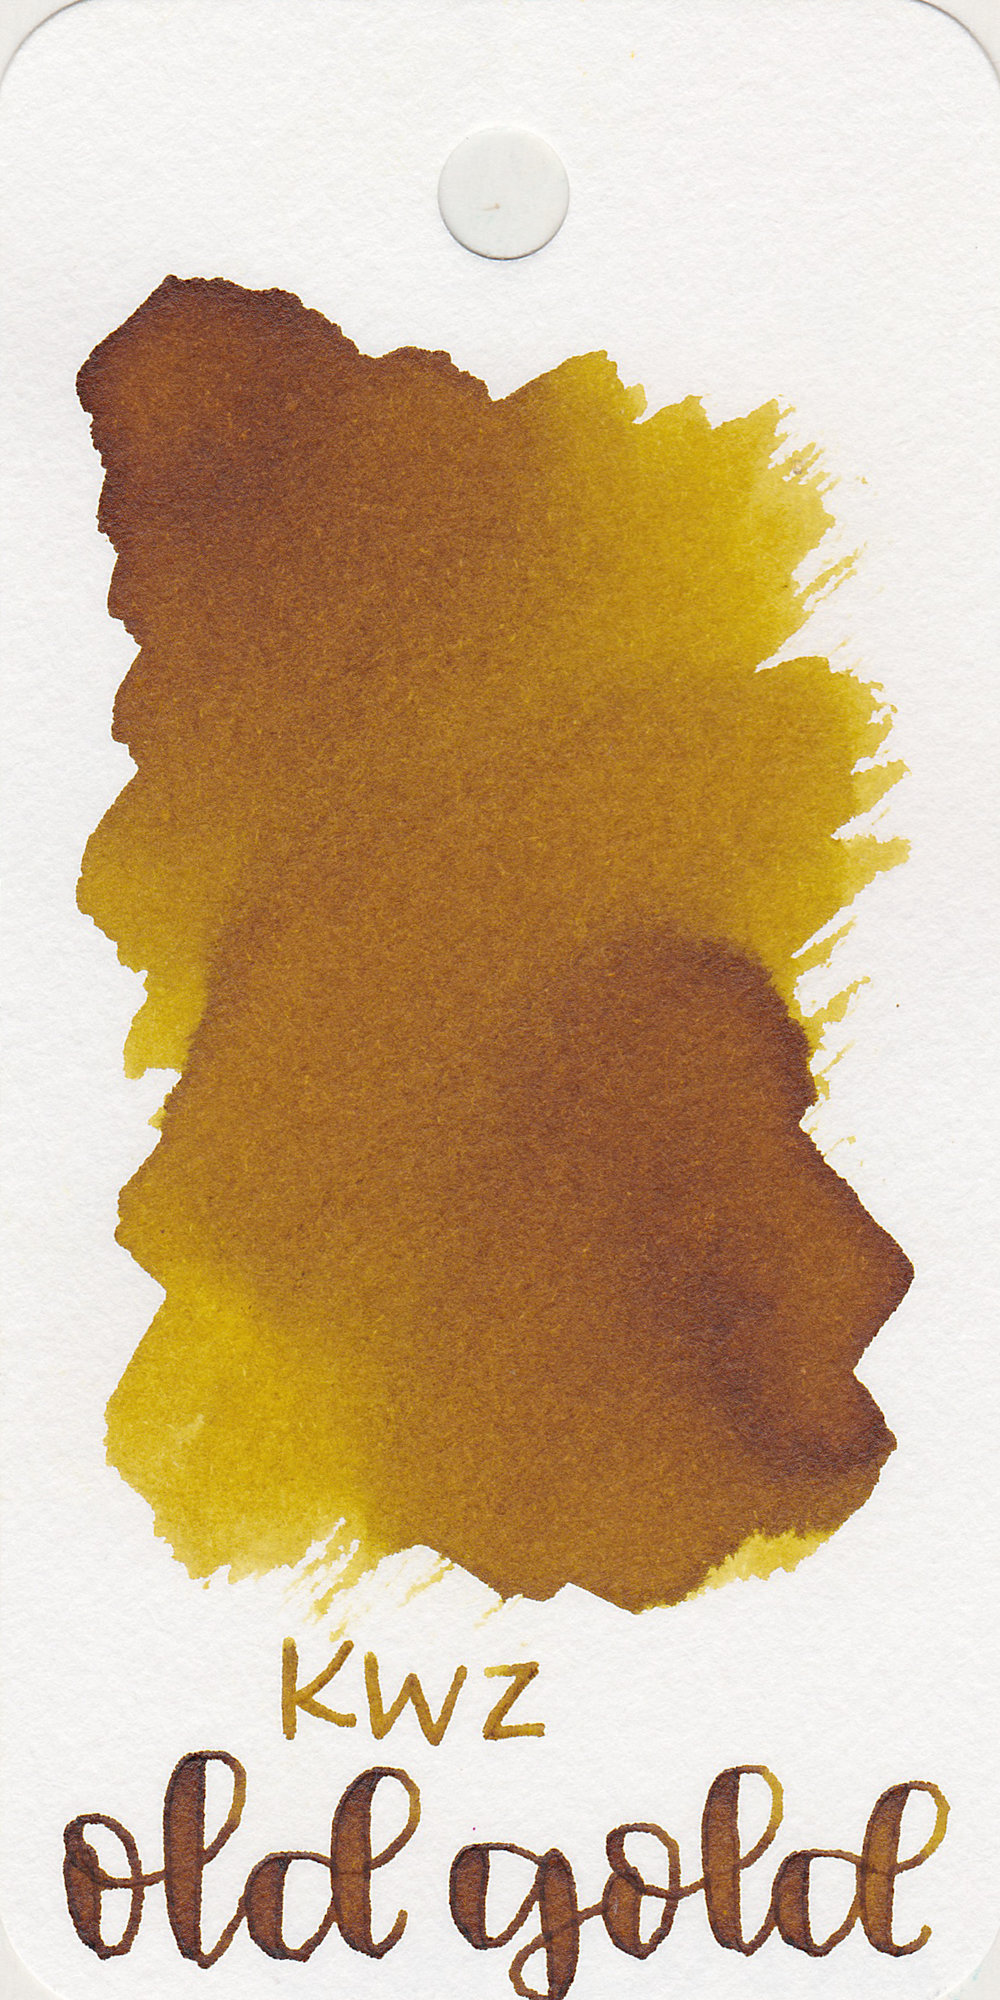 kwz-old-gold-1.jpg